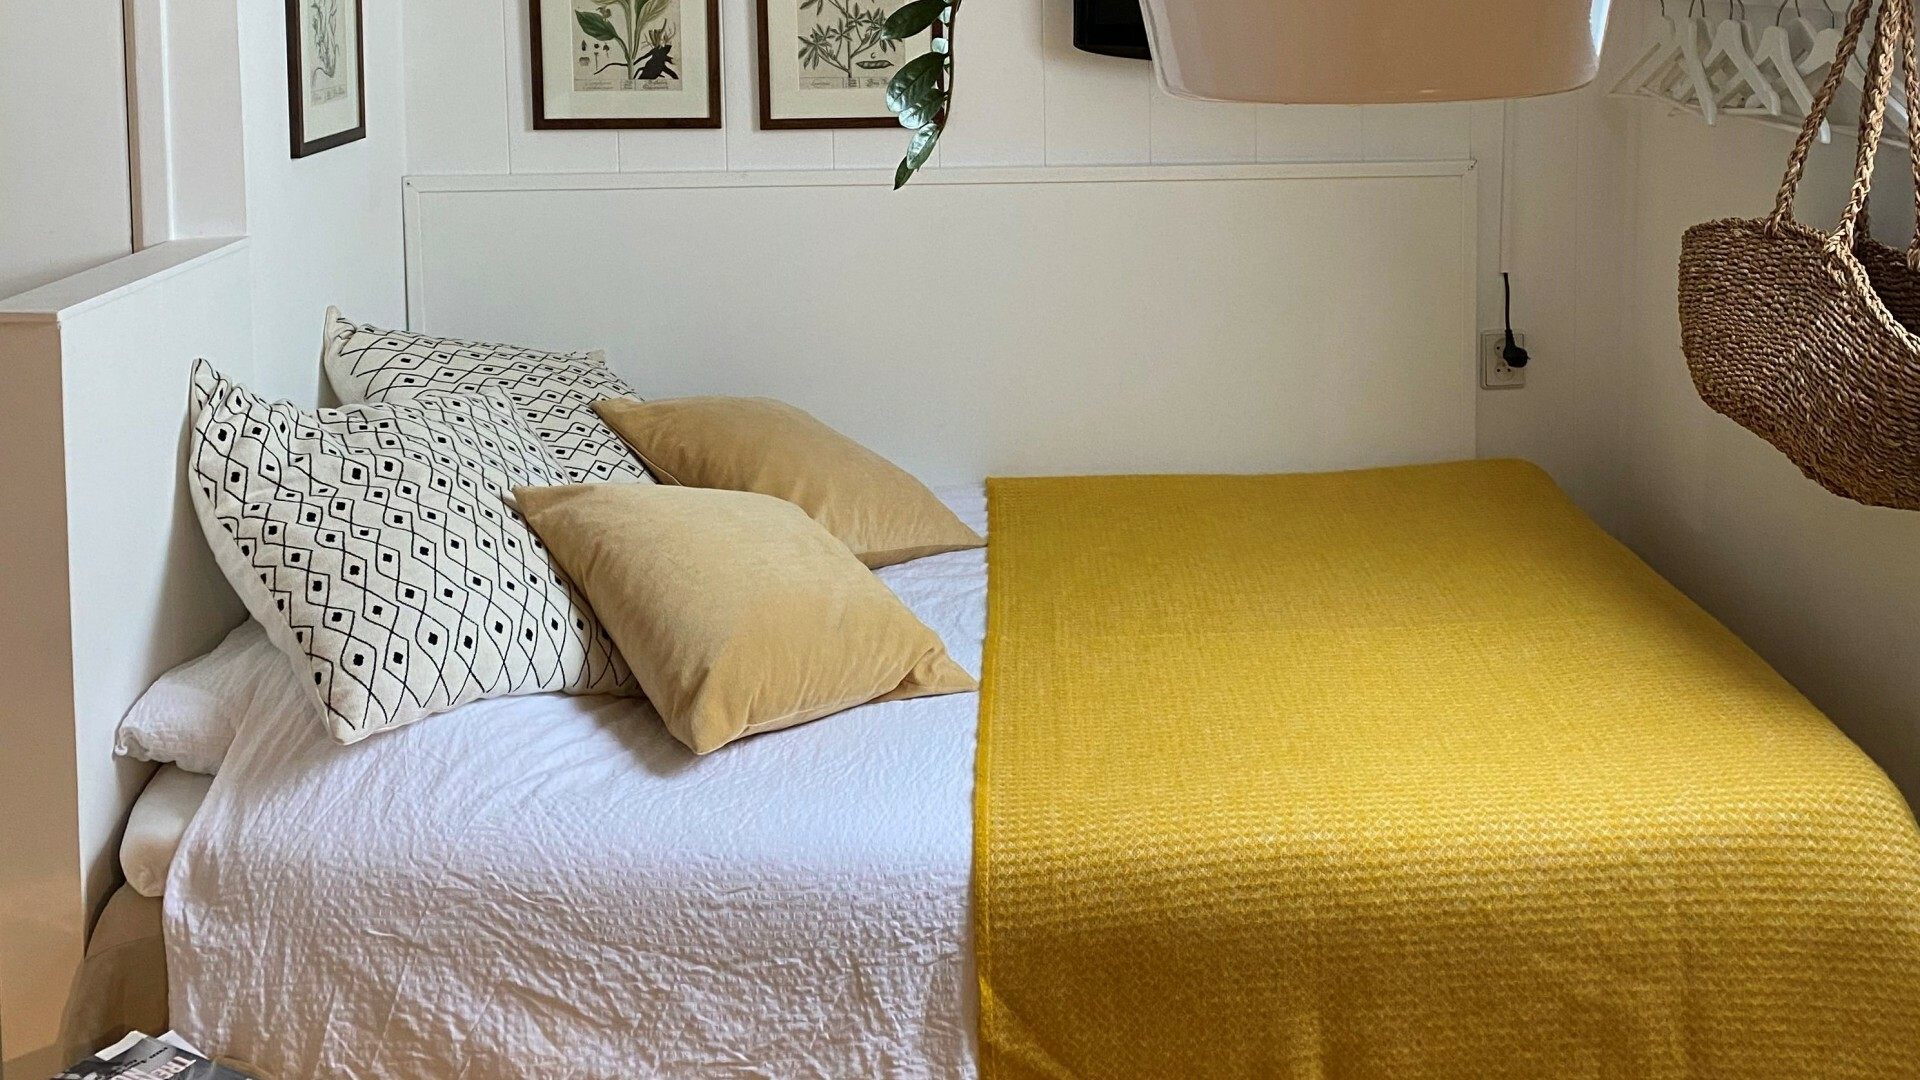 Slaapkamer bed en breakfast Klif 1 studio VVV Texel